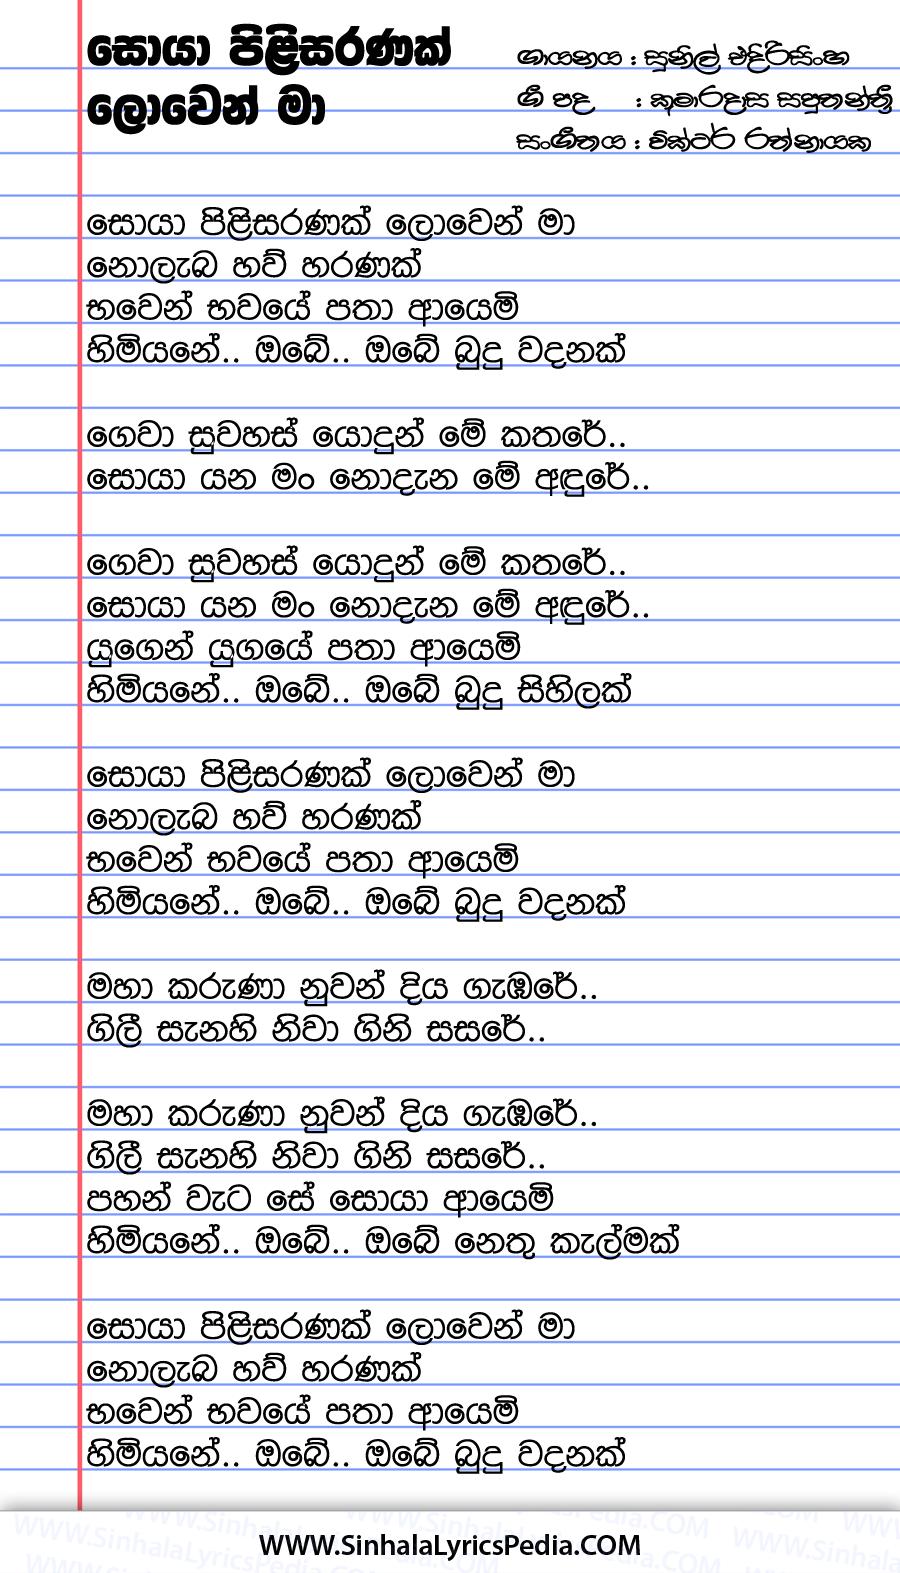 Soya Pilisaranak Lowen Ma Nolaba Hawu Haranak Song Lyrics